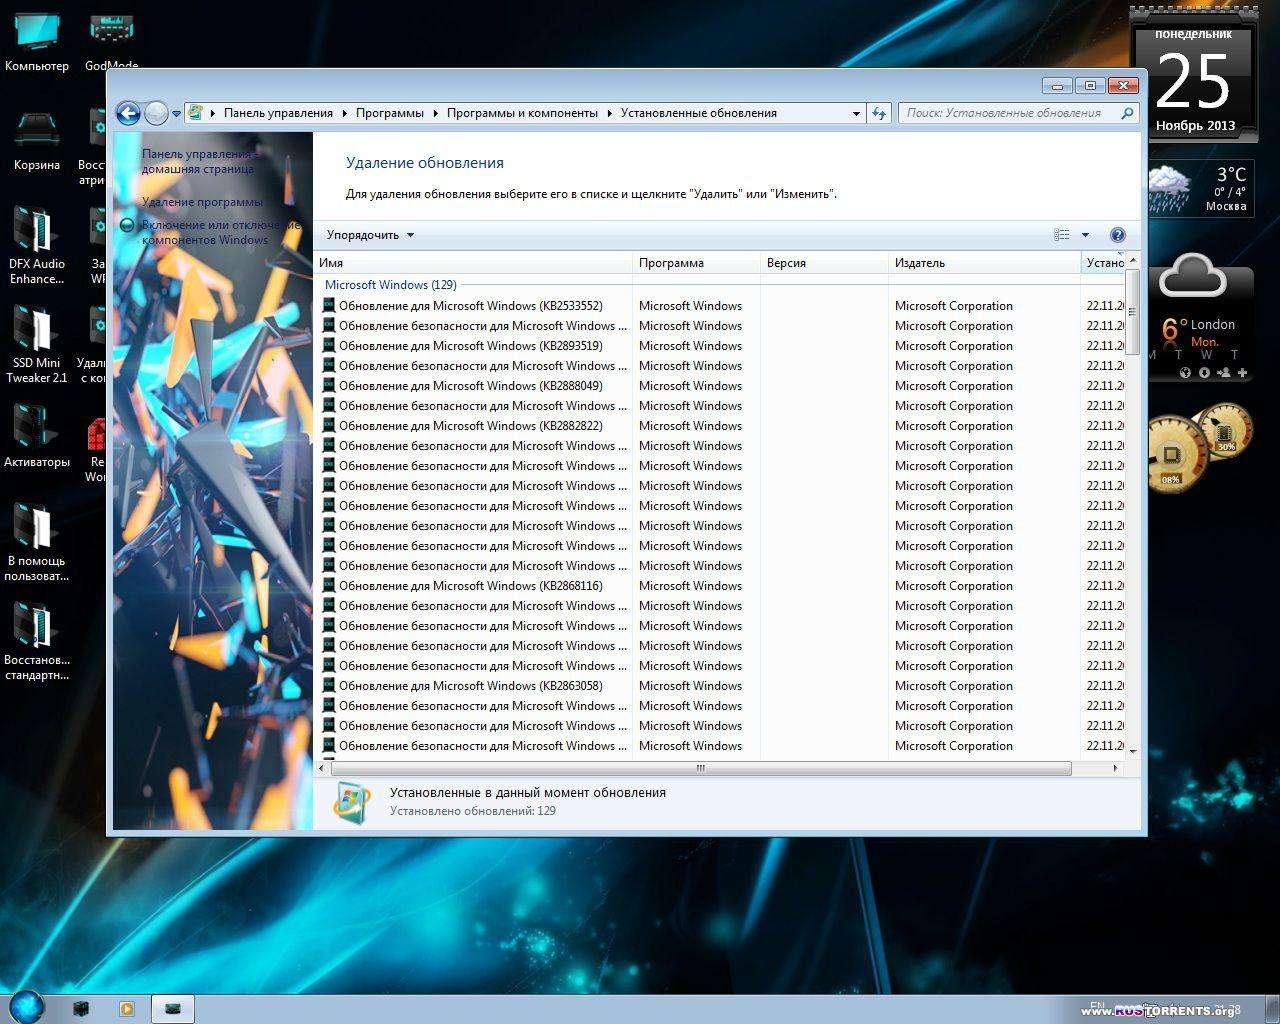 Windows 7 SP1 Ultimate x86/x64 MoN Edition V.2.08 RUS